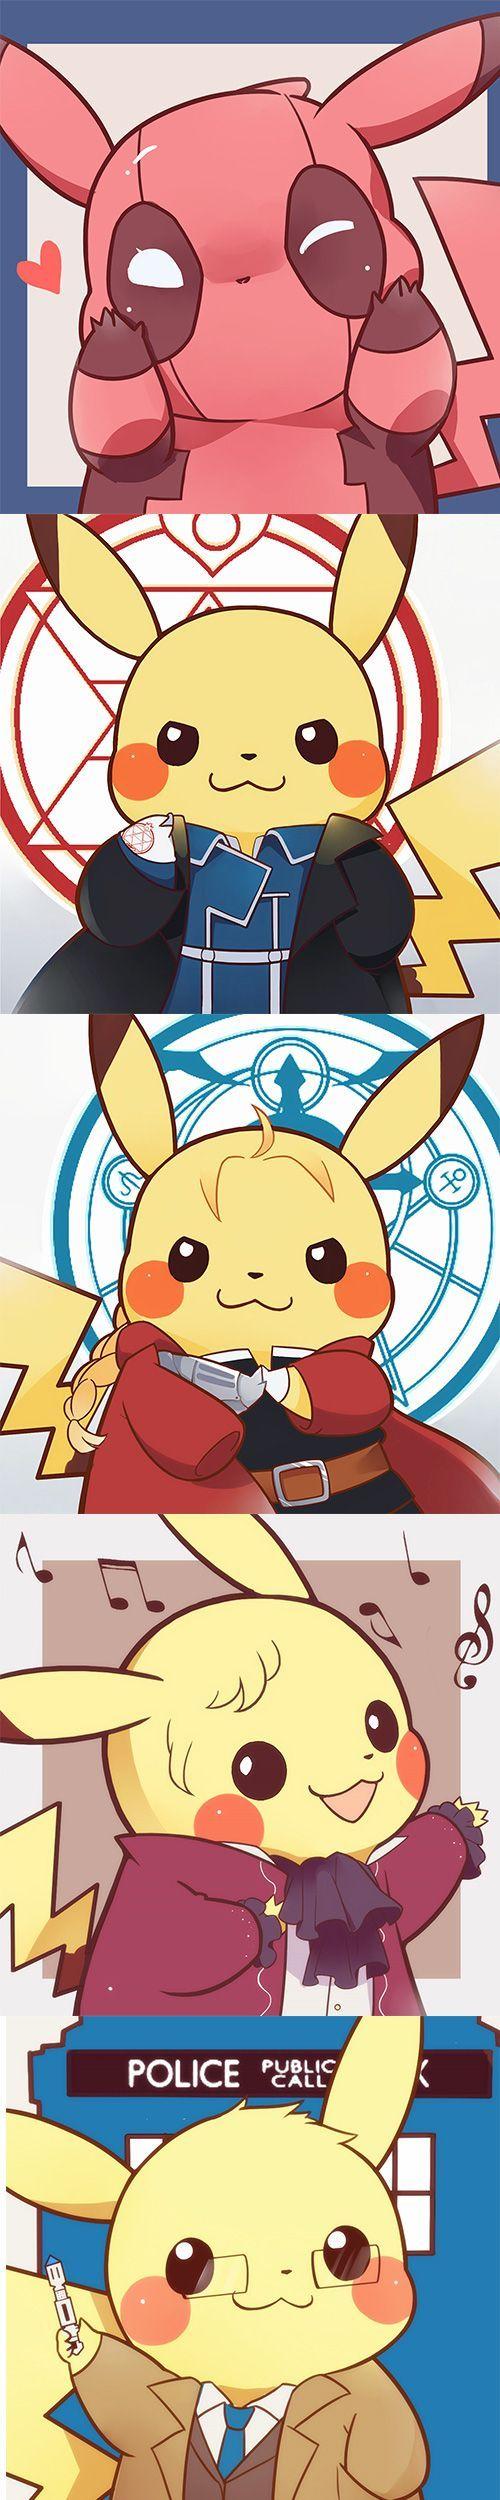 [Pokemon Daliy] Deadpool Pikachu!